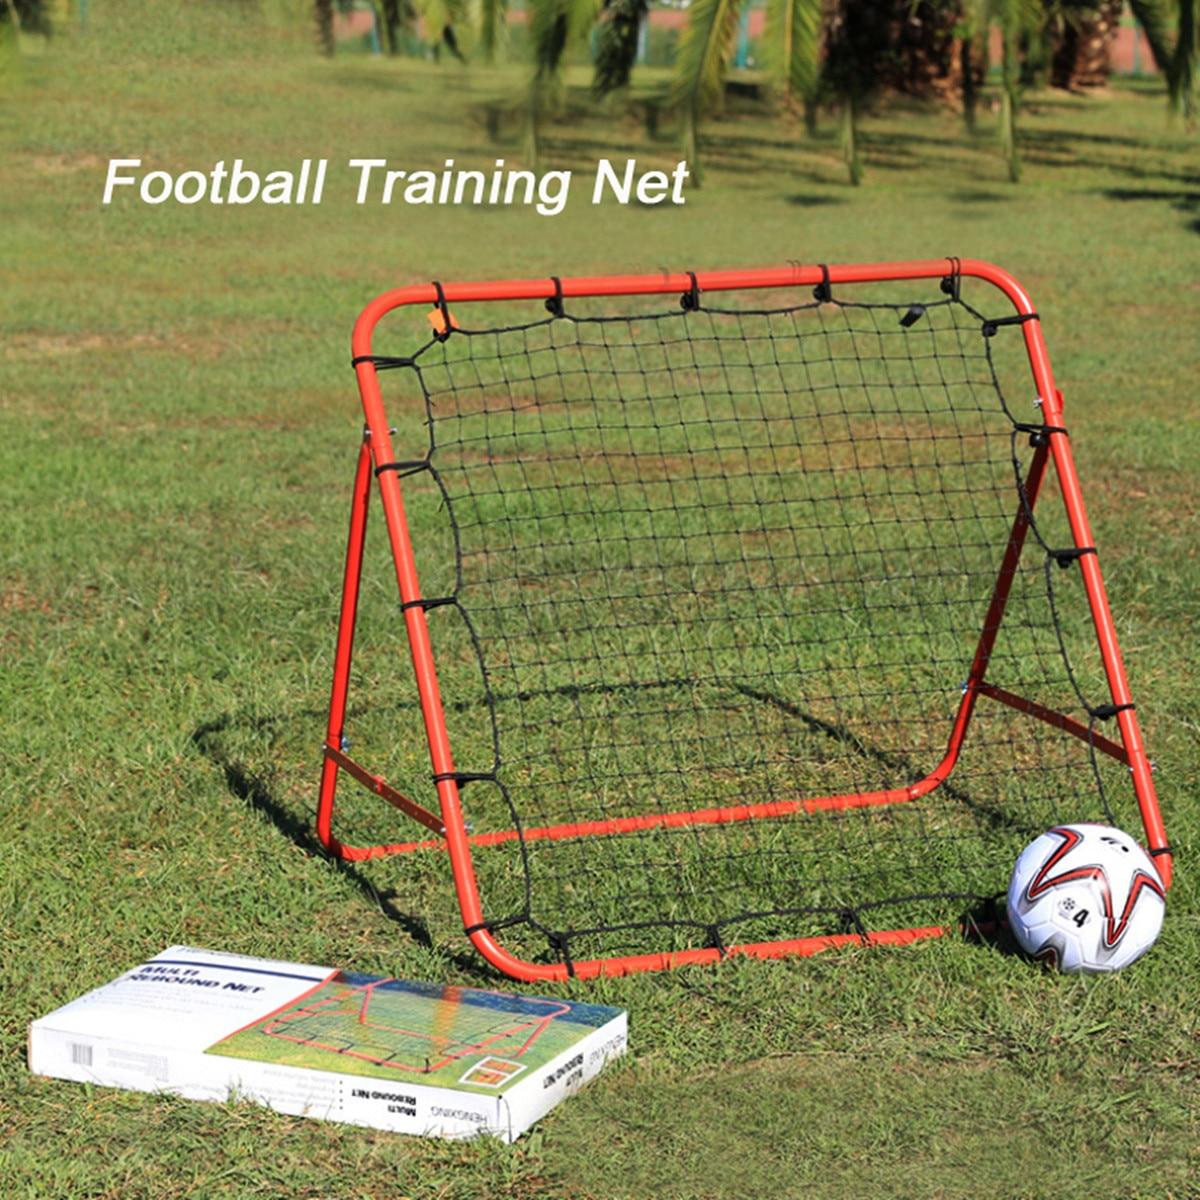 Football Soccer Baseball Rebound Target Mesh Net Outdoor Sports Football Training Aid Soccer Ball Practice soccer skills training